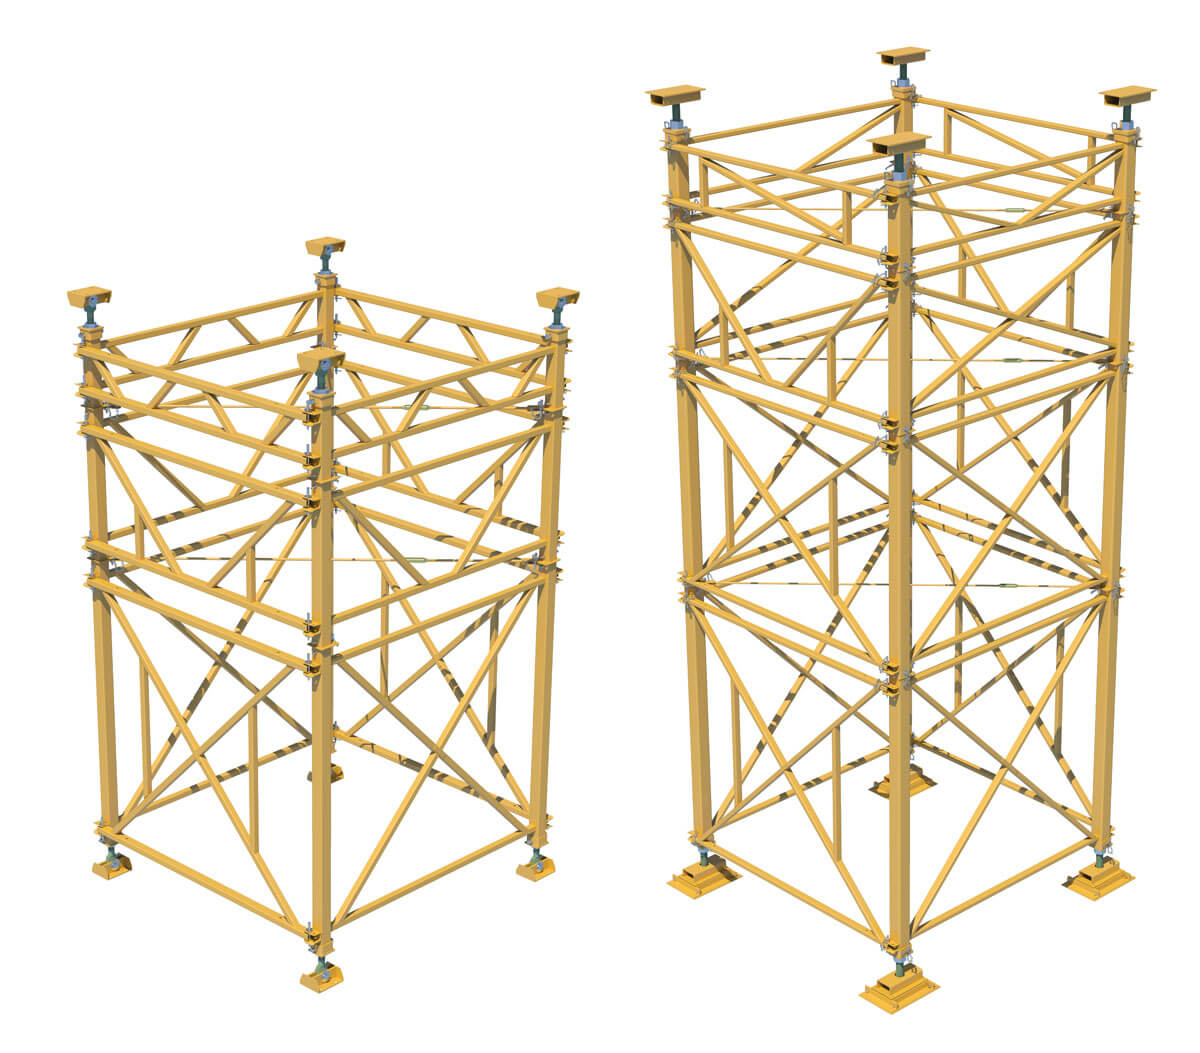 50K & 100K Shore Tower System